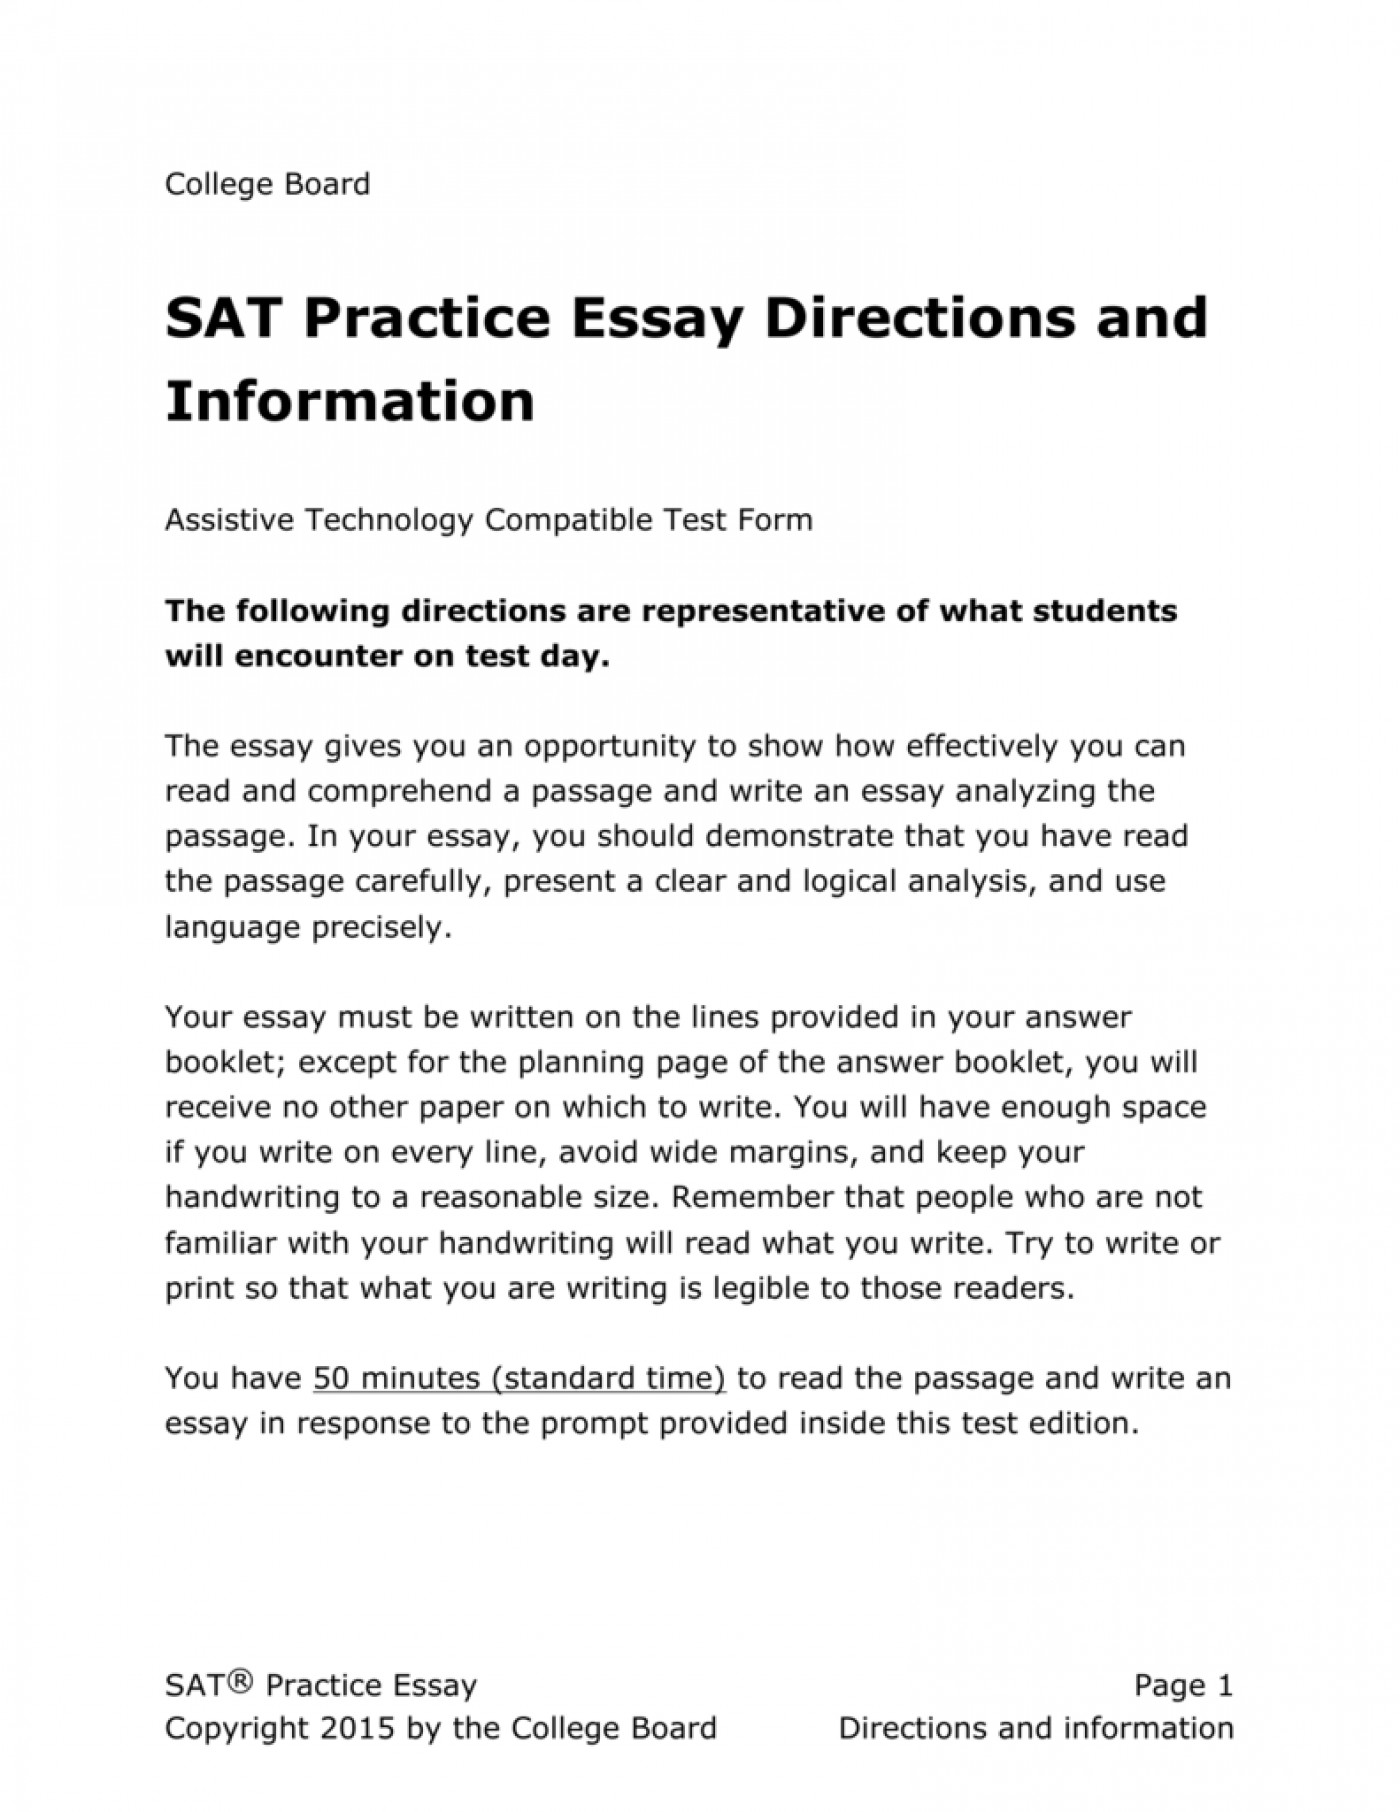 006 Sat Practice Test Essay Pdf Essays Sleep College Boards Answer